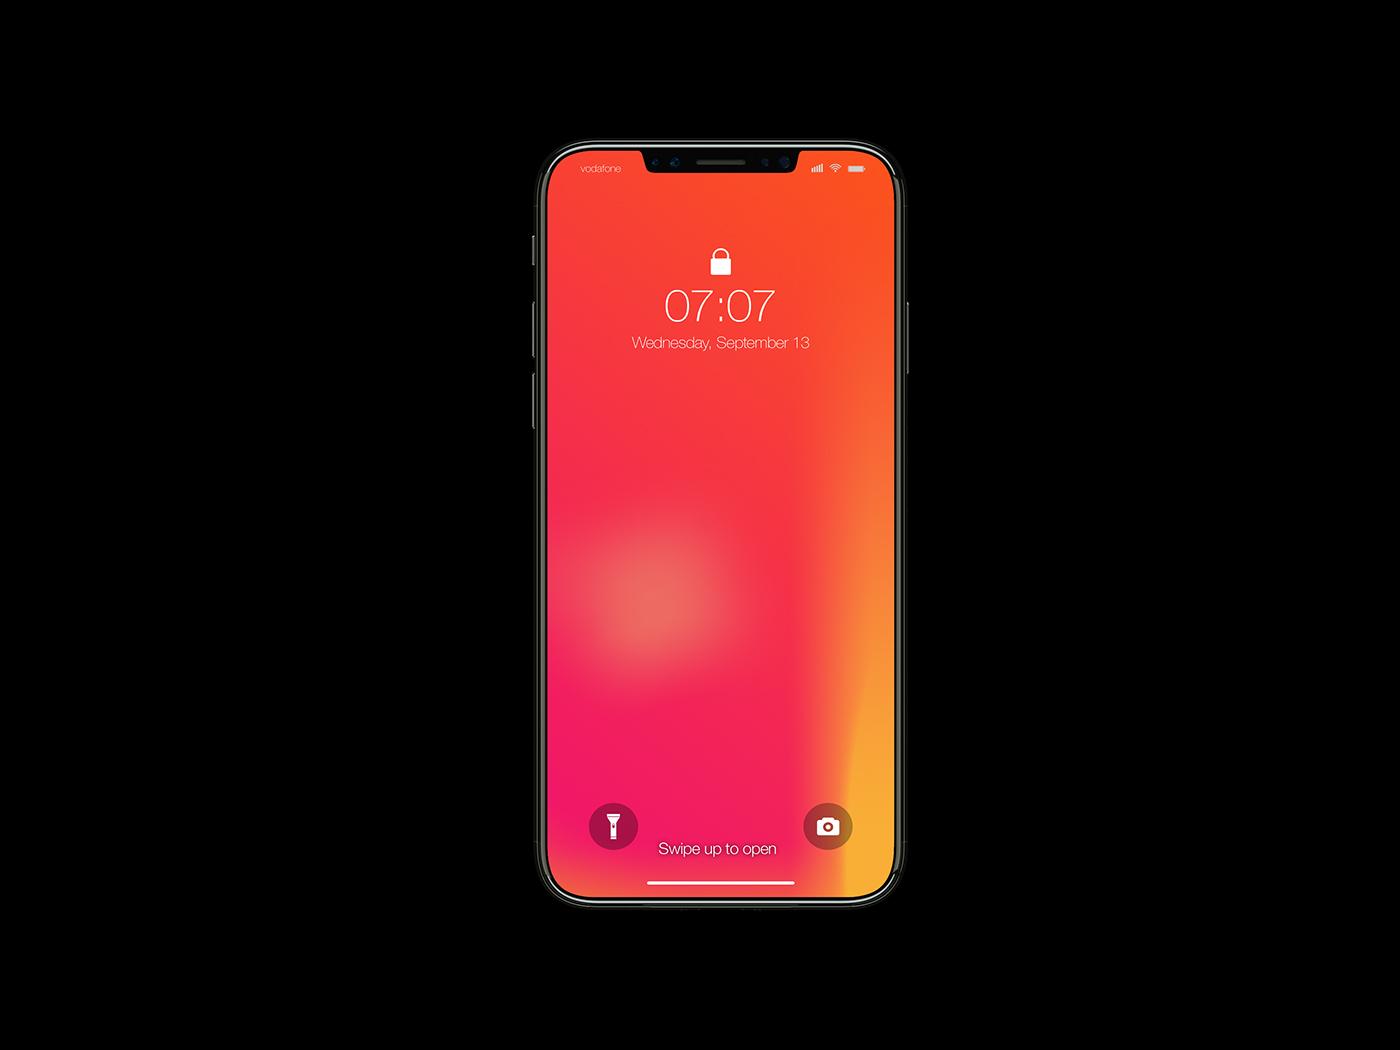 Apple Samsung OLED pantailarako bestelako alternatiben bila